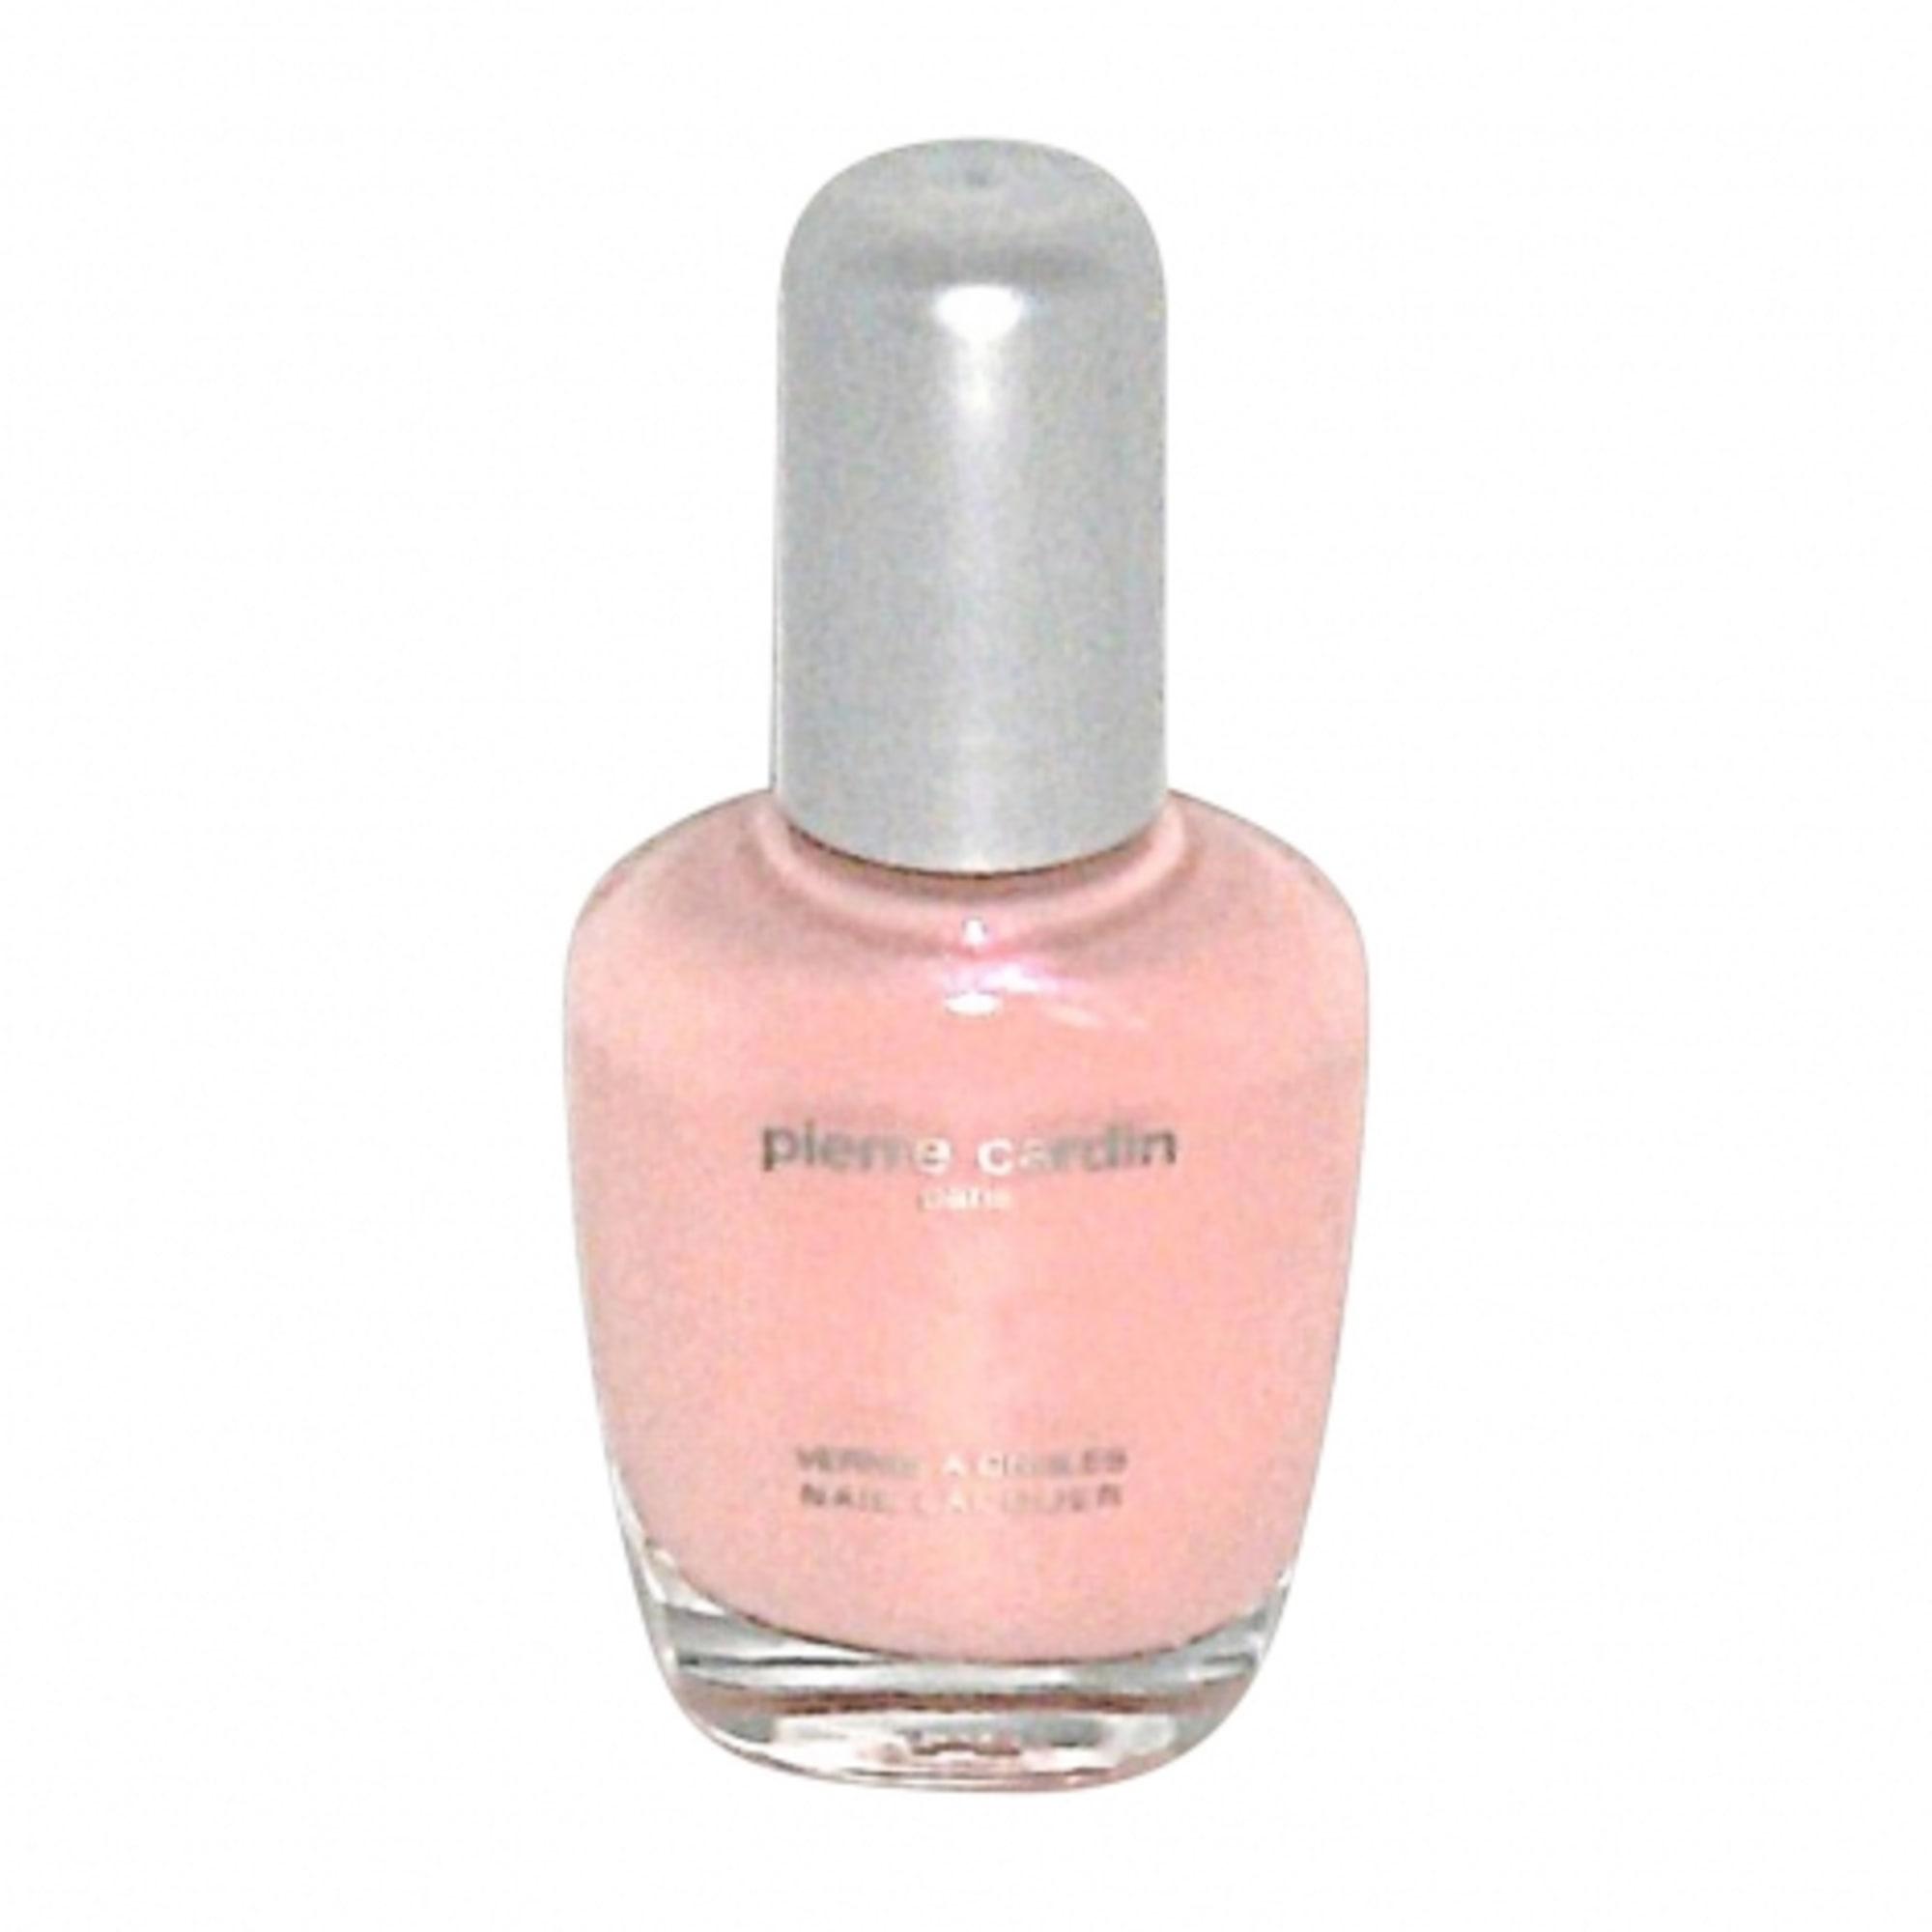 Vernis à ongles PIERRE CARDIN Rose-pastel (Baby rose)